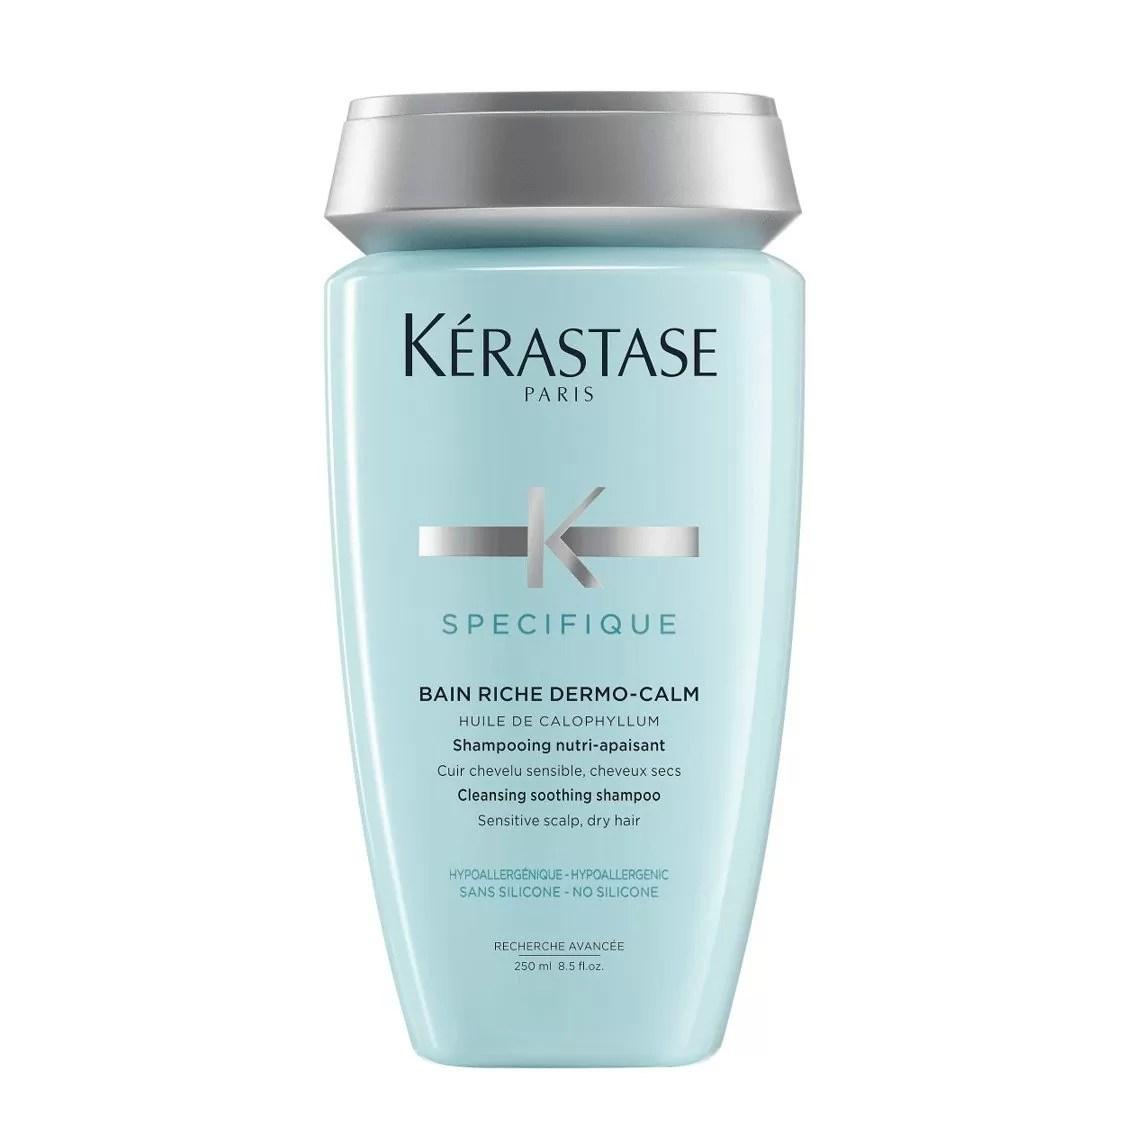 Kerastase Specifique Bain Riche Dermo-Calm Cleansing Soothing Shampoo (Sensitive Scalp, Dry Hair) 250ml